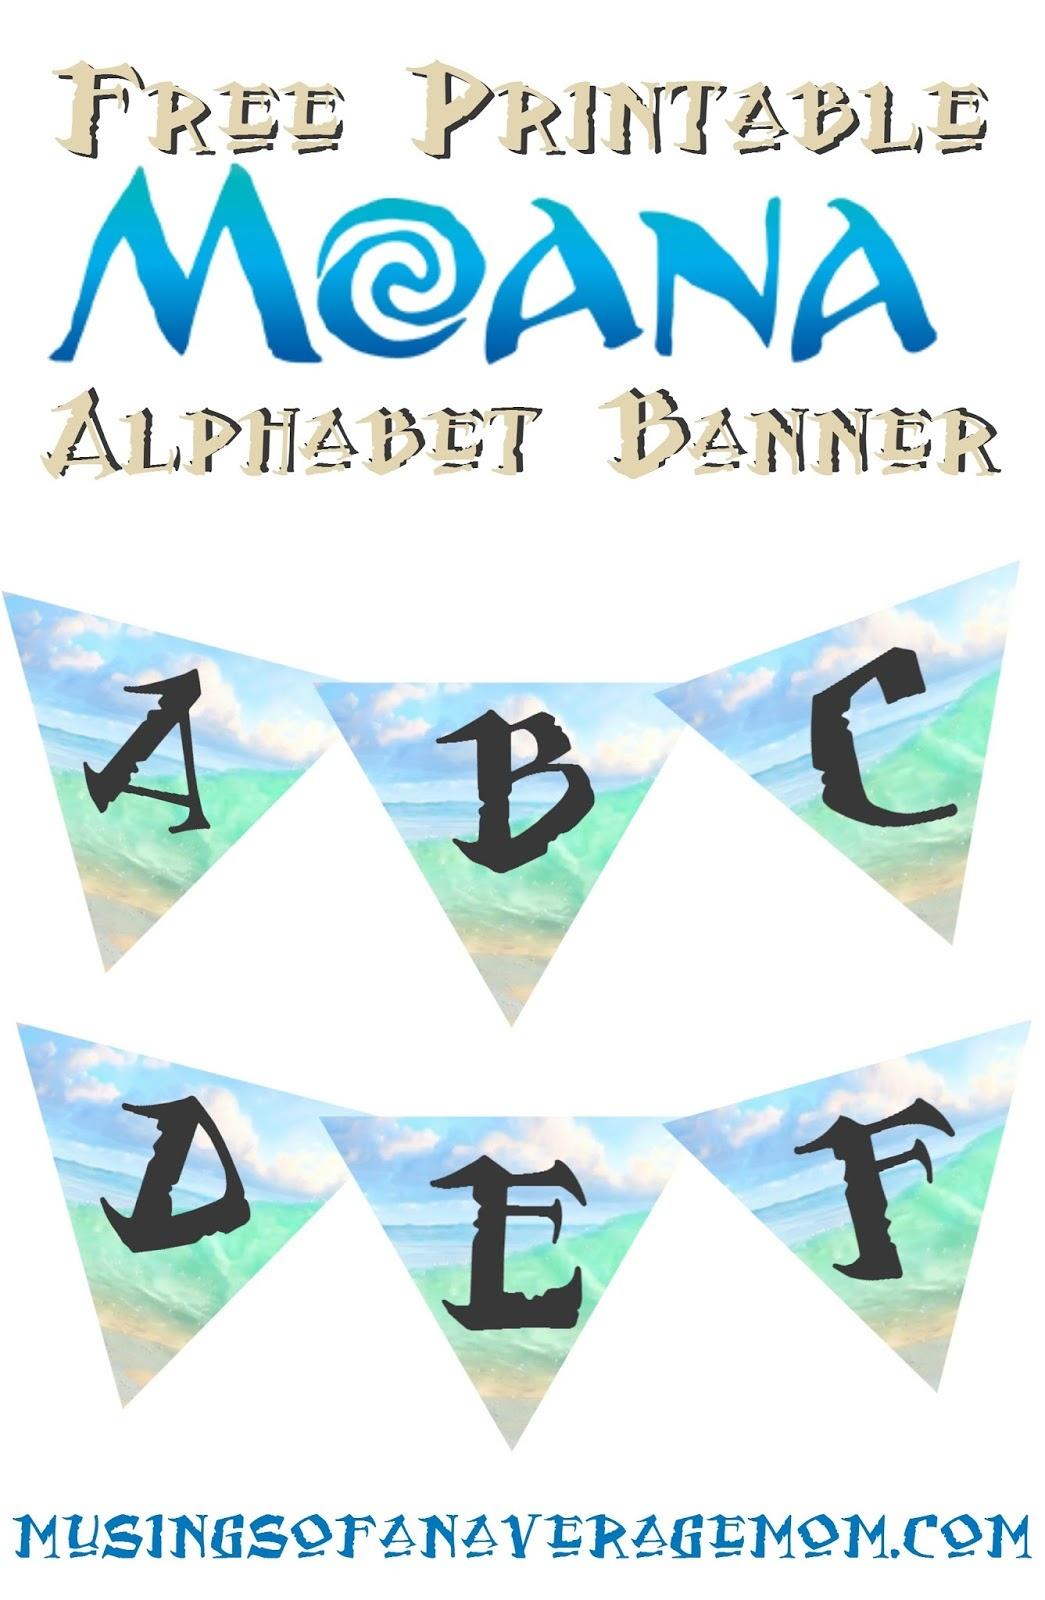 Musings Of An Average Mom: Moana Birthday Banner - Free Printable Moana Banner